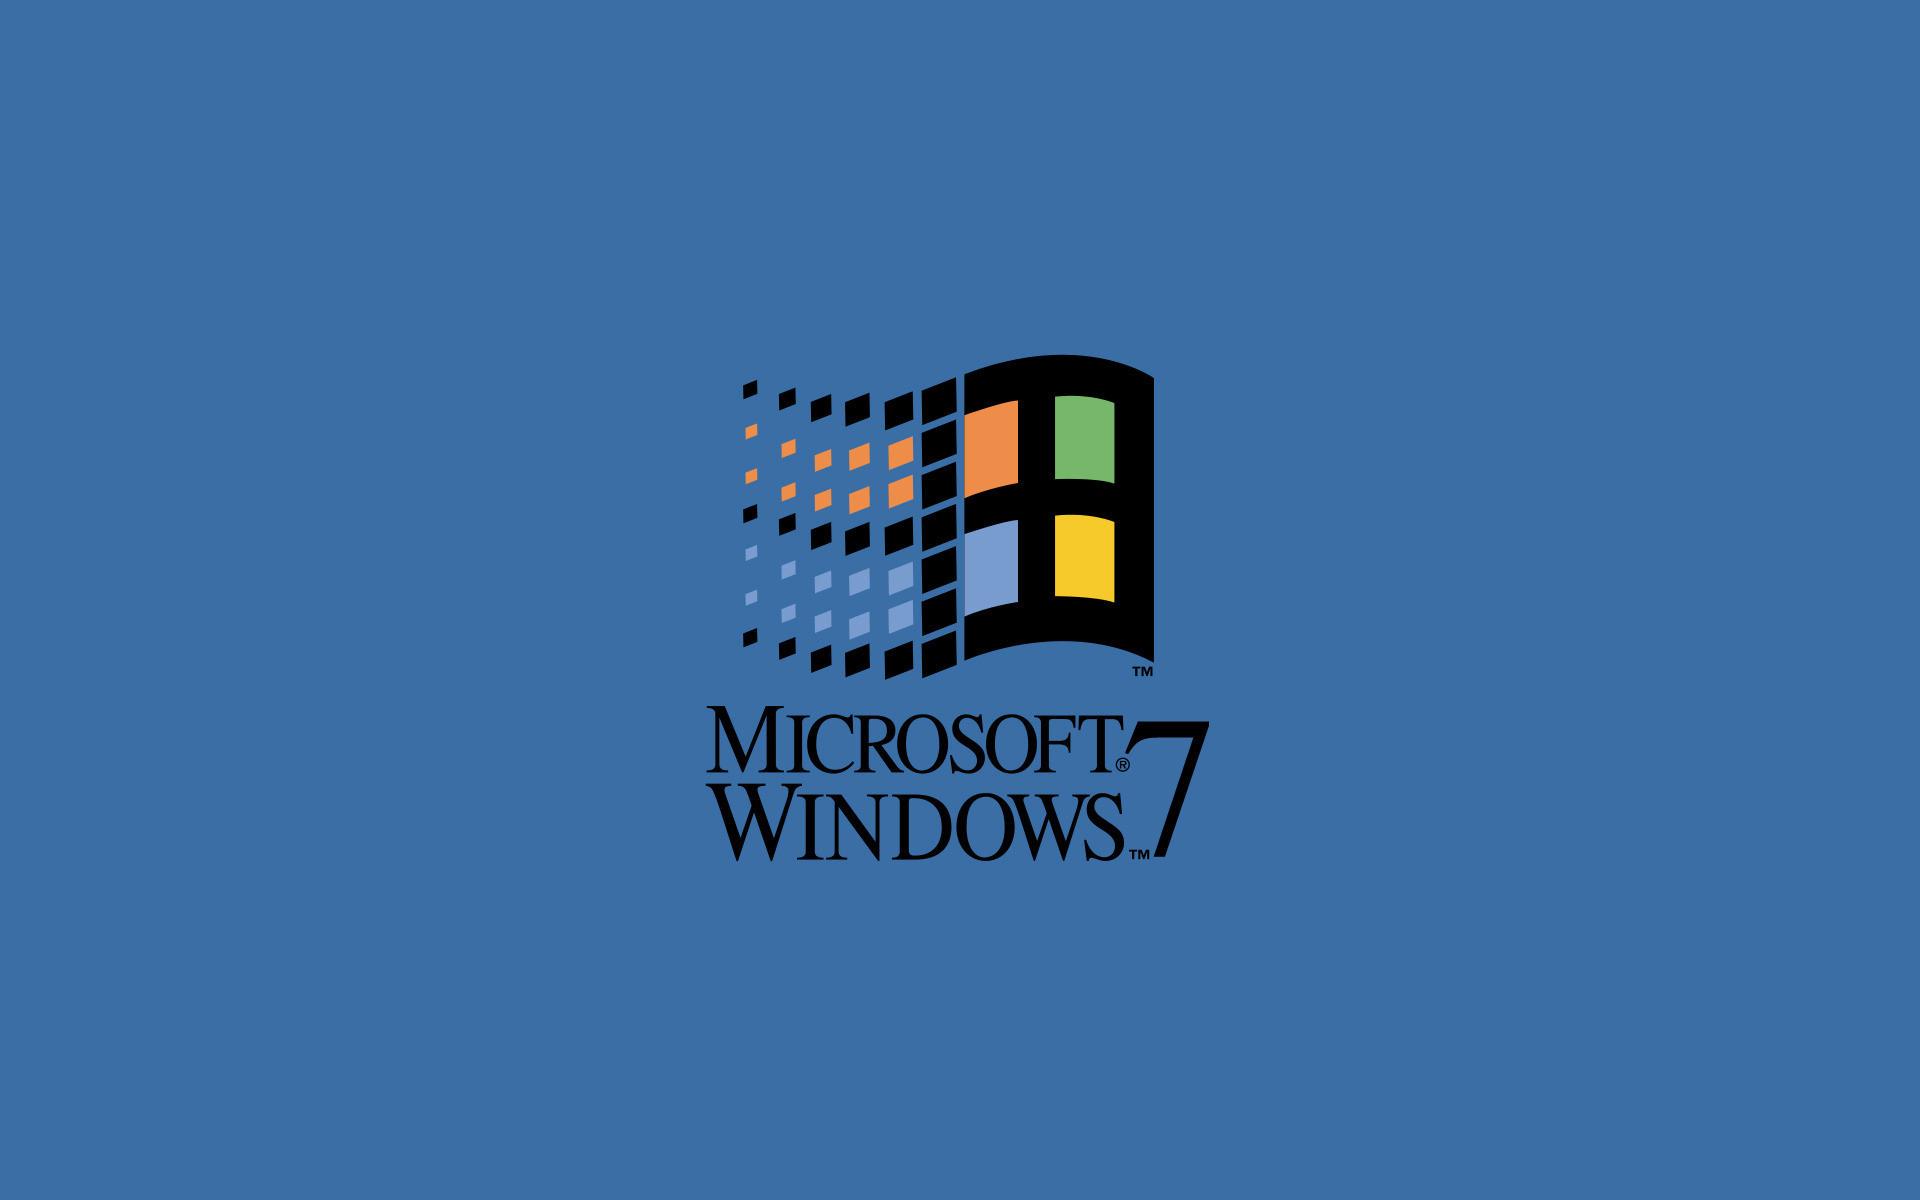 logo windows xp logo windows 98 logo windows me logo png windows nt .